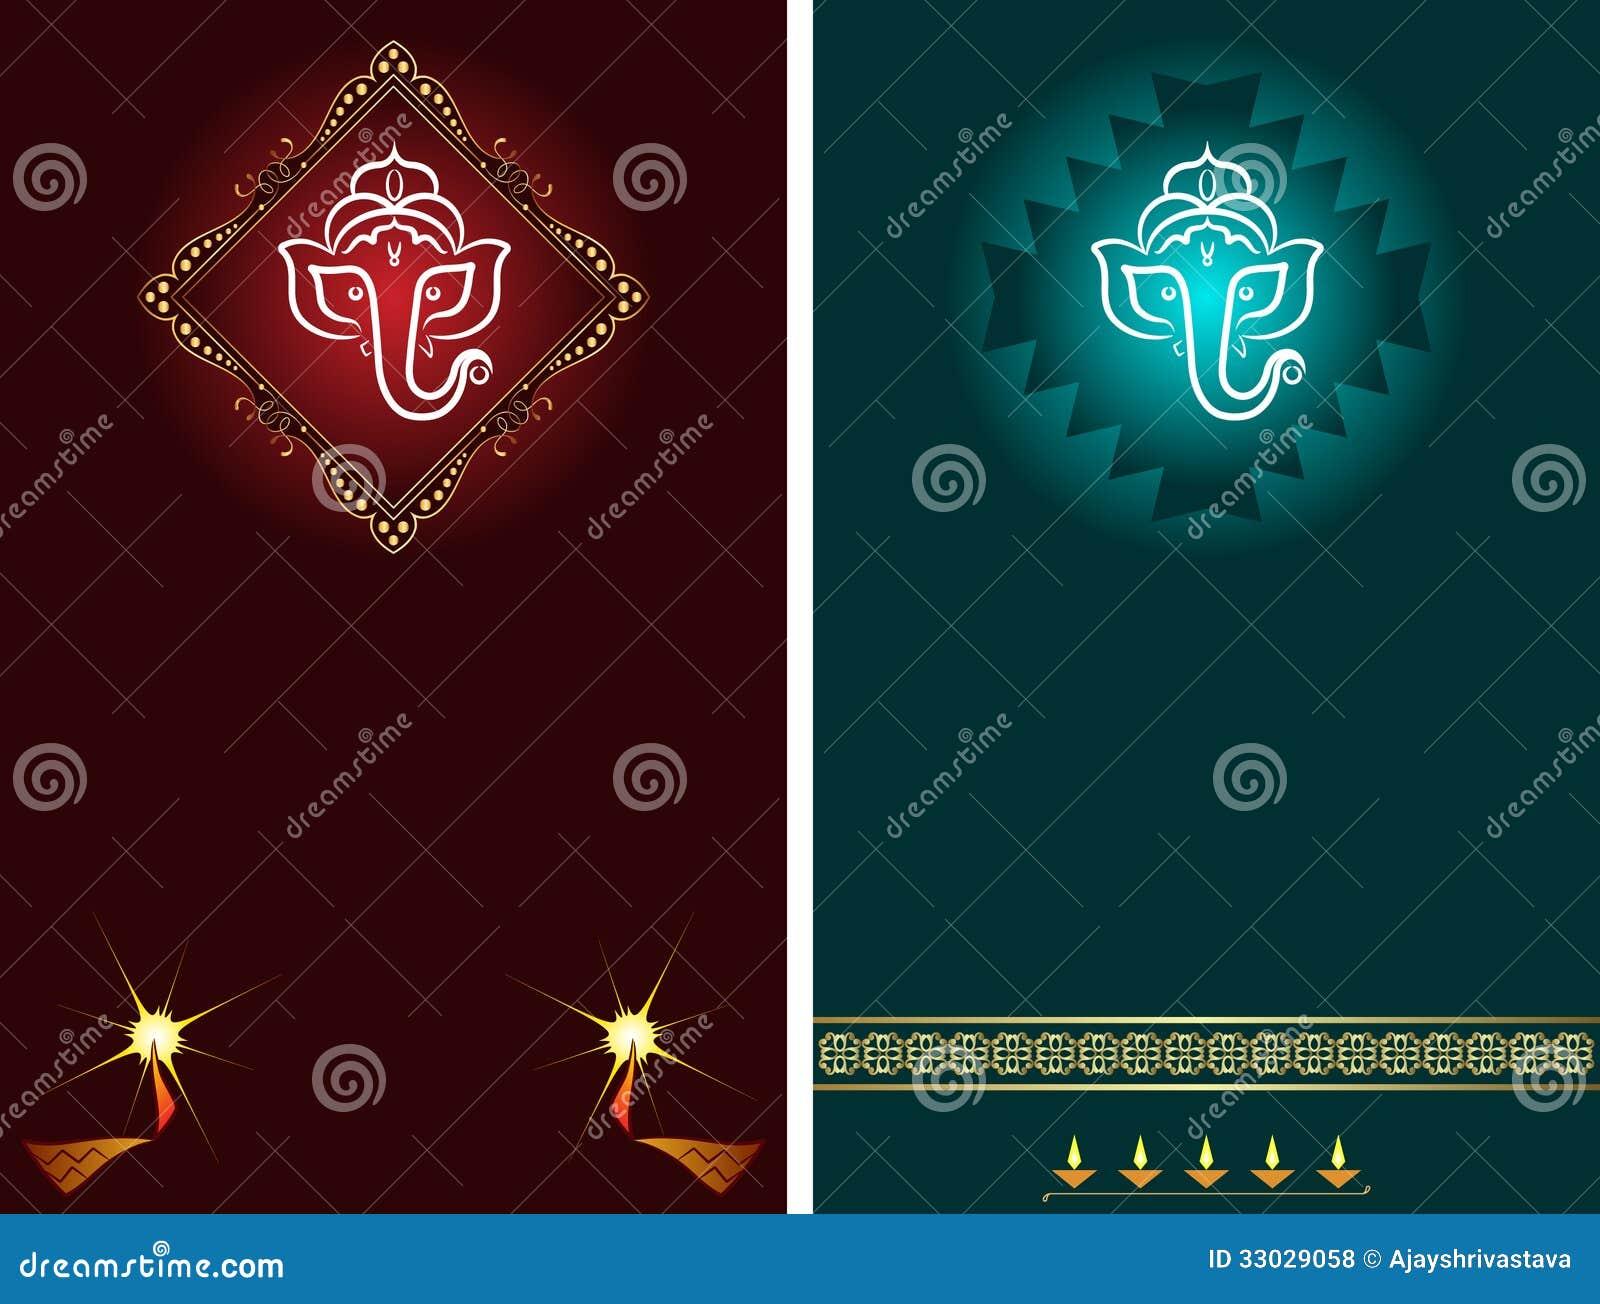 Ganesha diwali greeting stock illustration illustration of icon download comp m4hsunfo